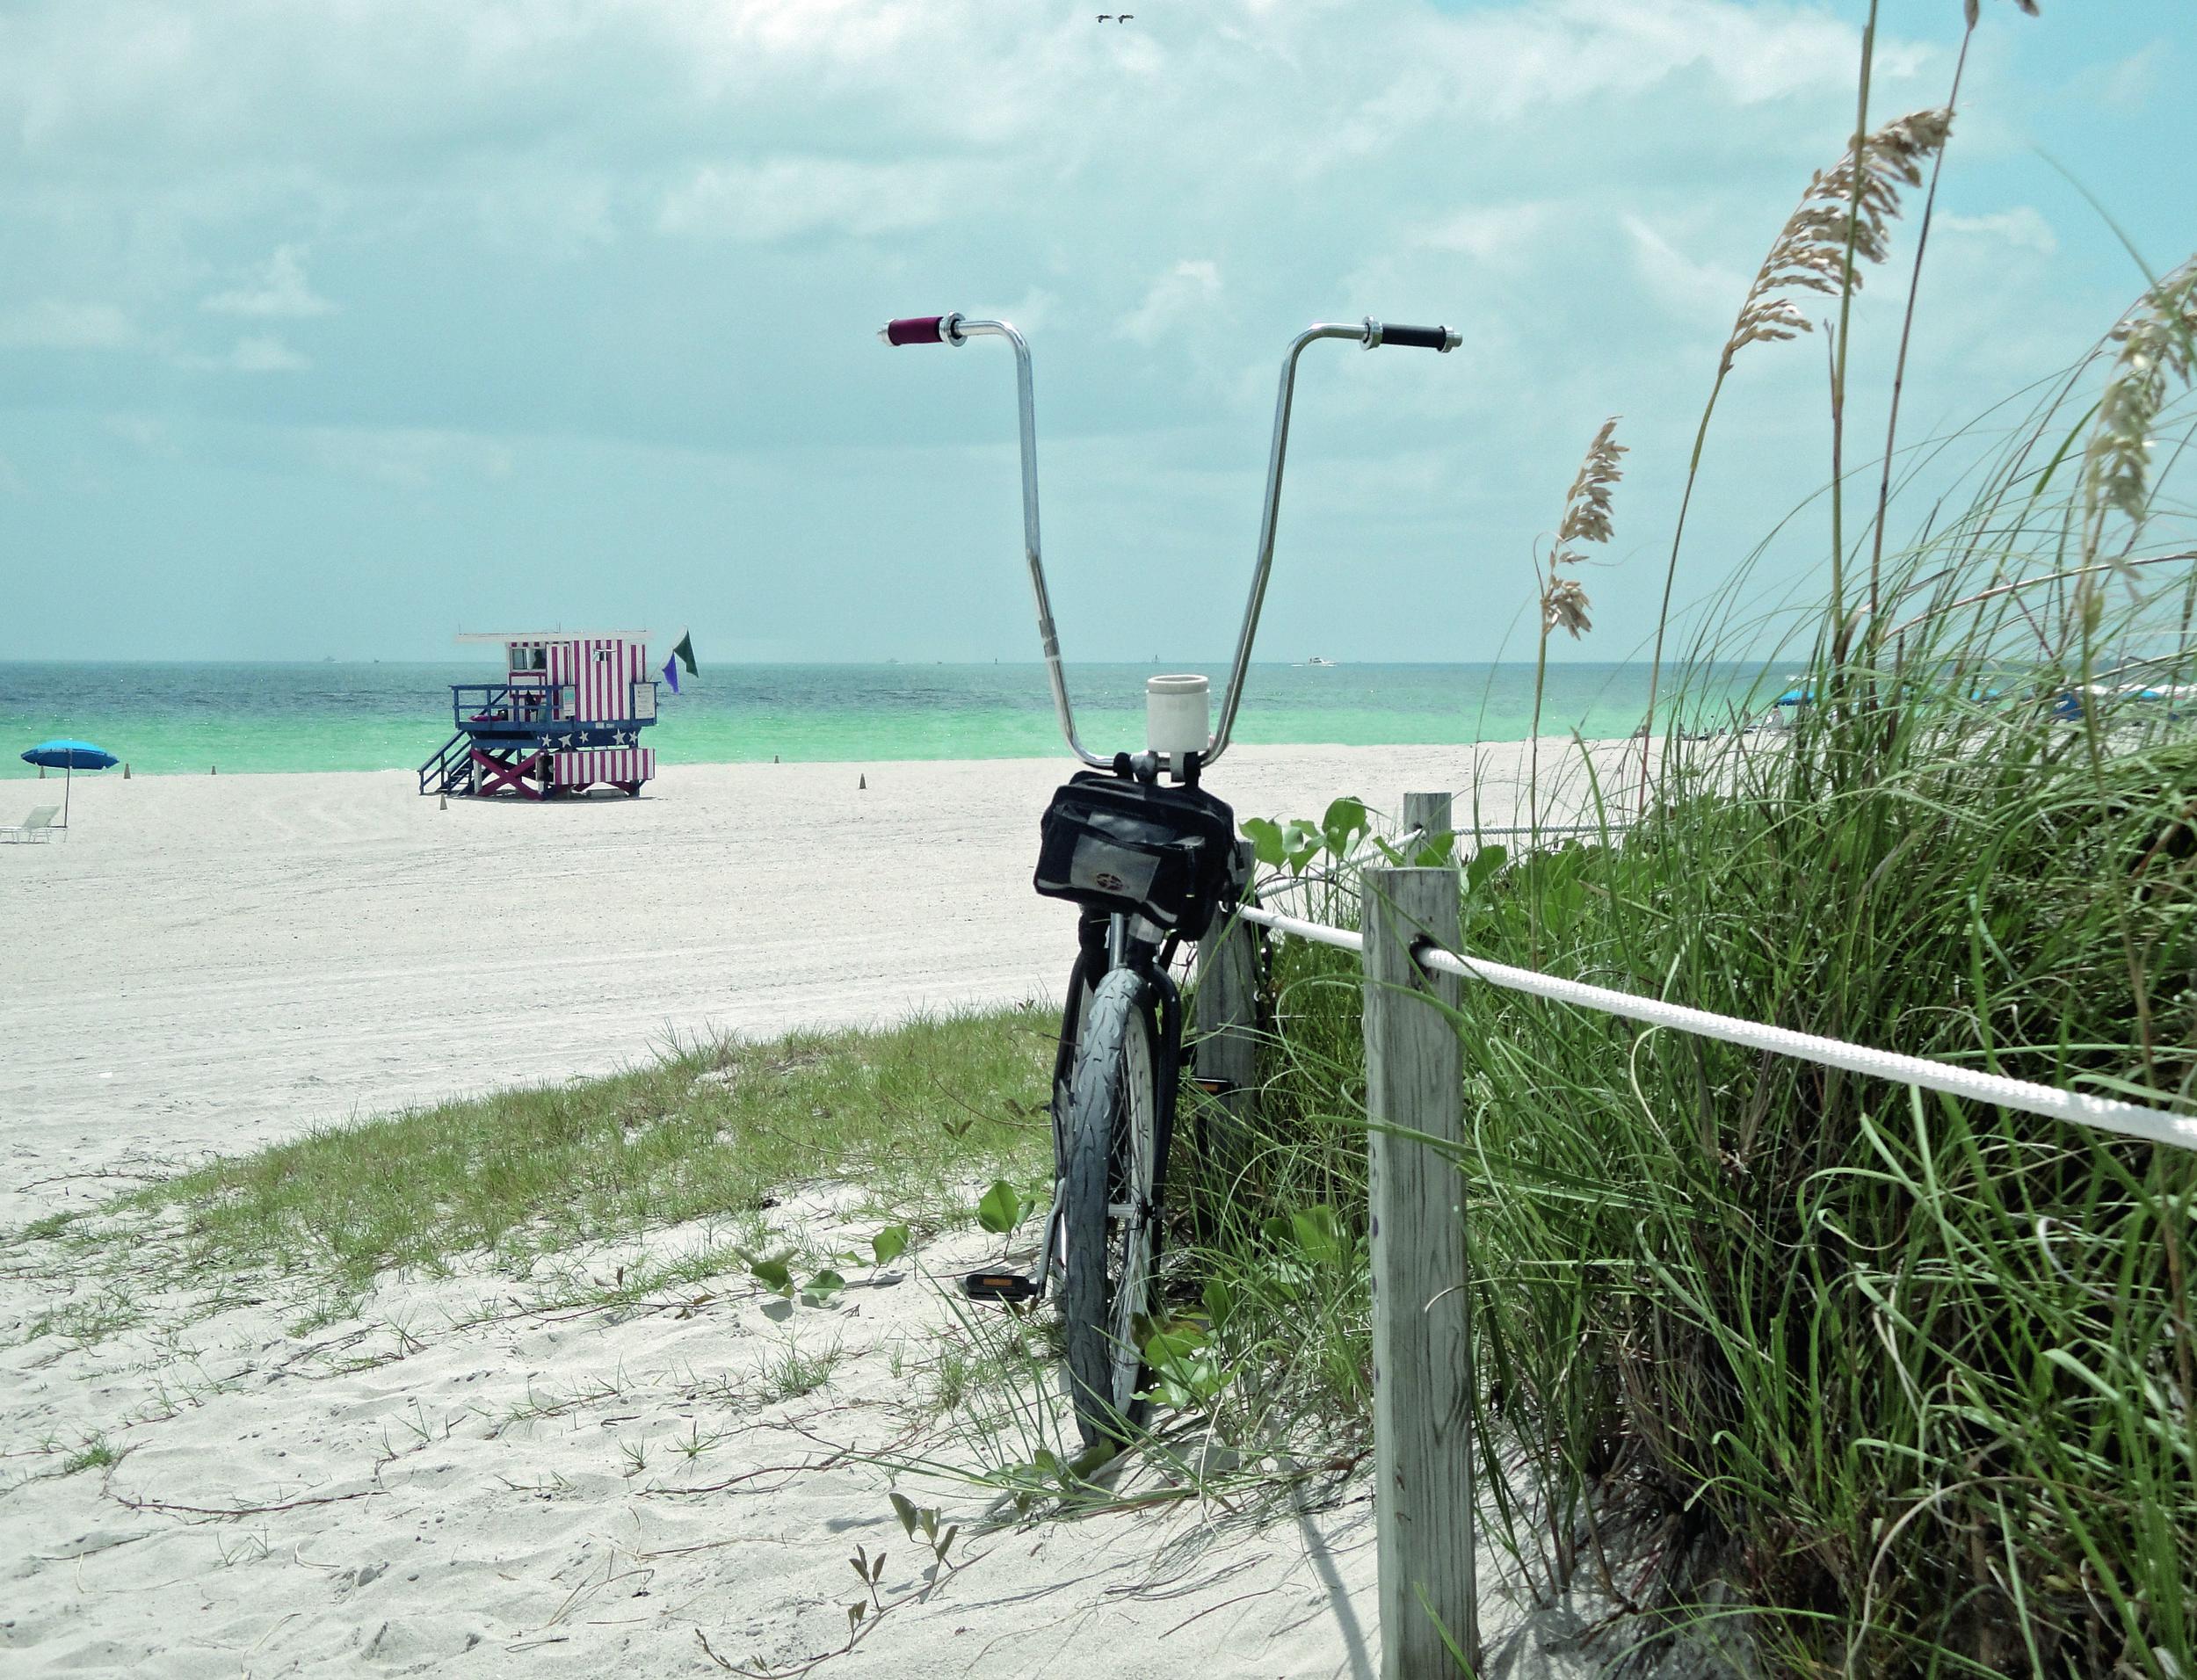 MIA_00300_beach_bicycle_001.jpg